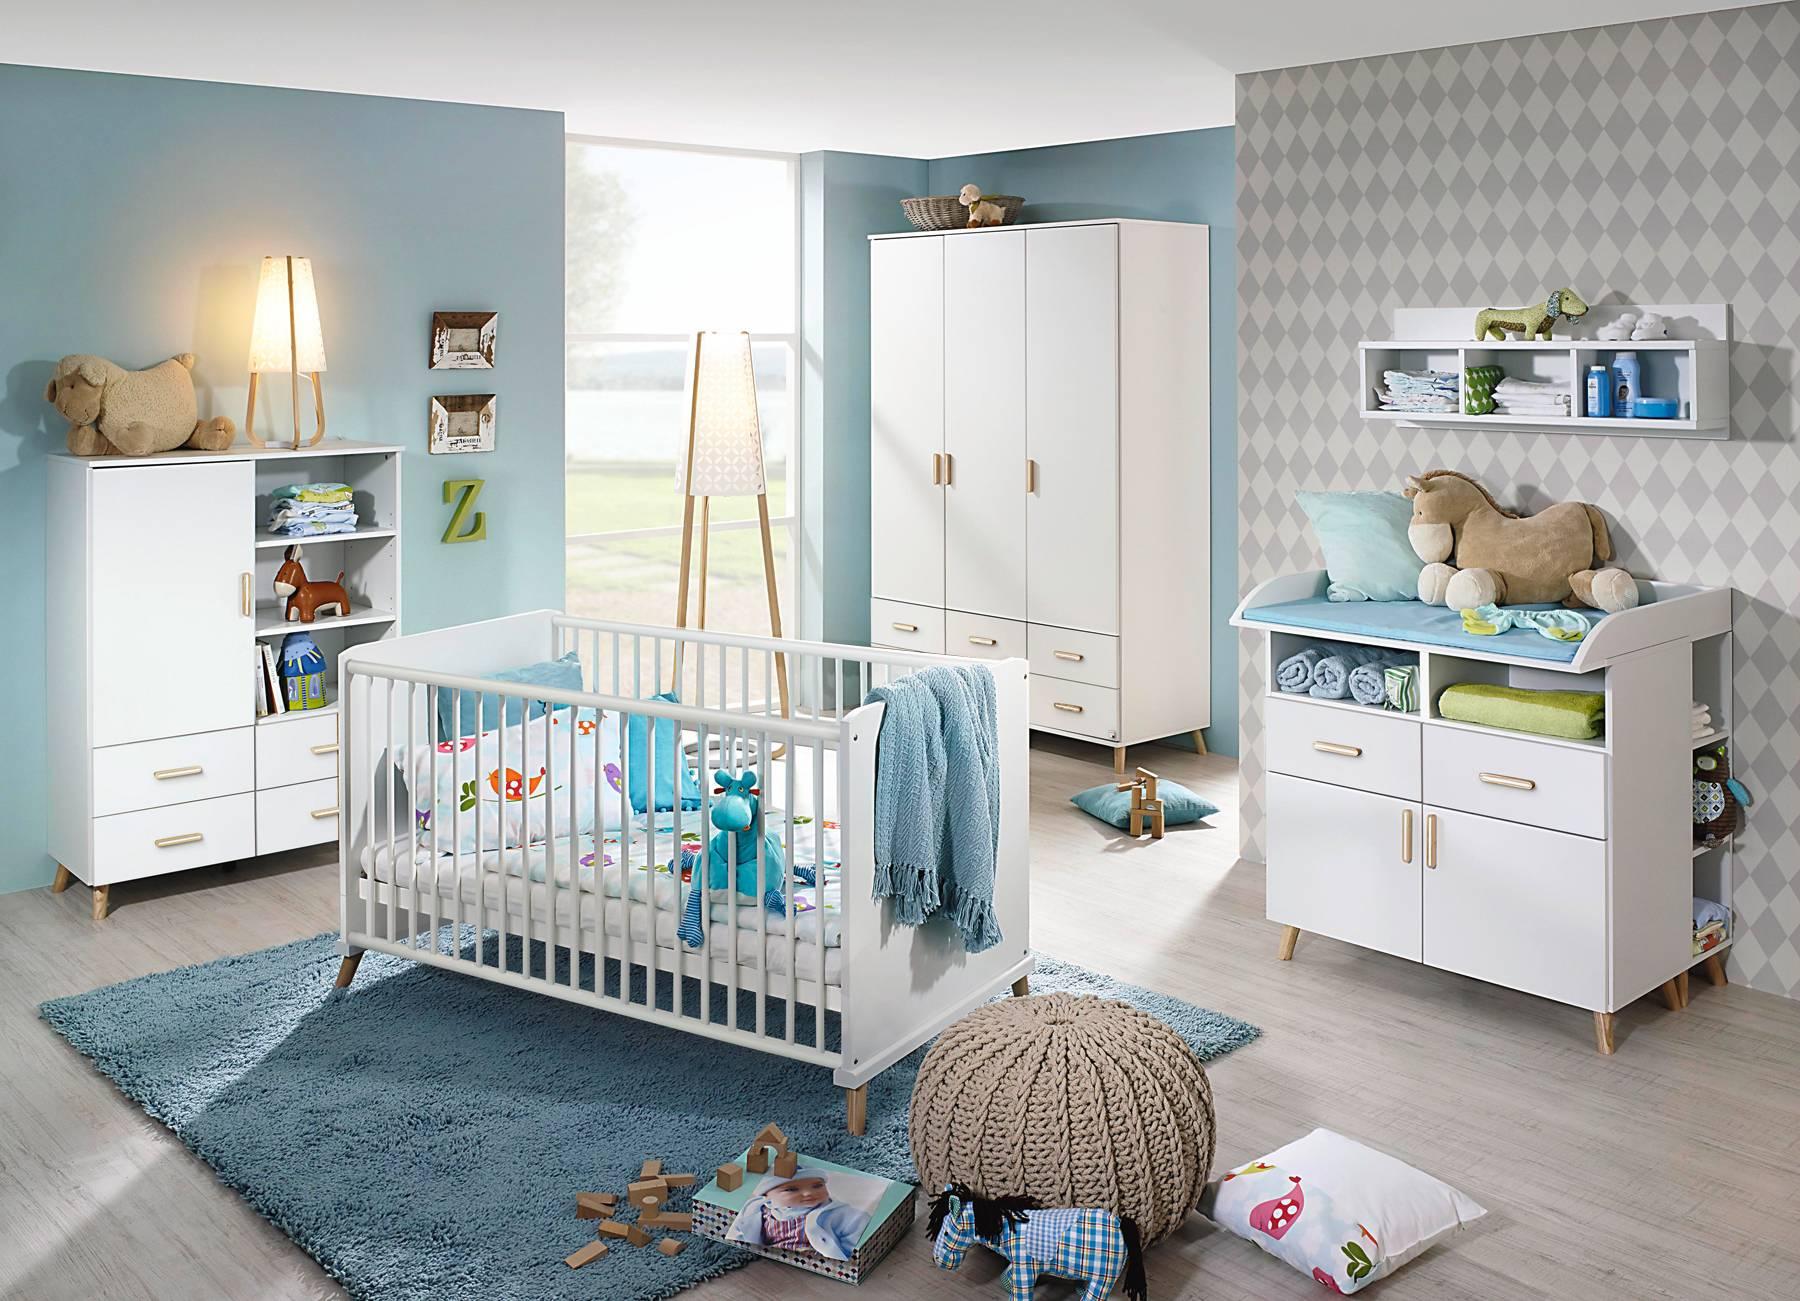 Full Size of Babyzimmer Komplett Set 4 Teilig Alpinwei Esche Coimbra Schlafzimmer Massivholz Komplettes Regal Badezimmer Günstige Kinderzimmer Wohnzimmer Mit Lattenrost Kinderzimmer Baby Kinderzimmer Komplett